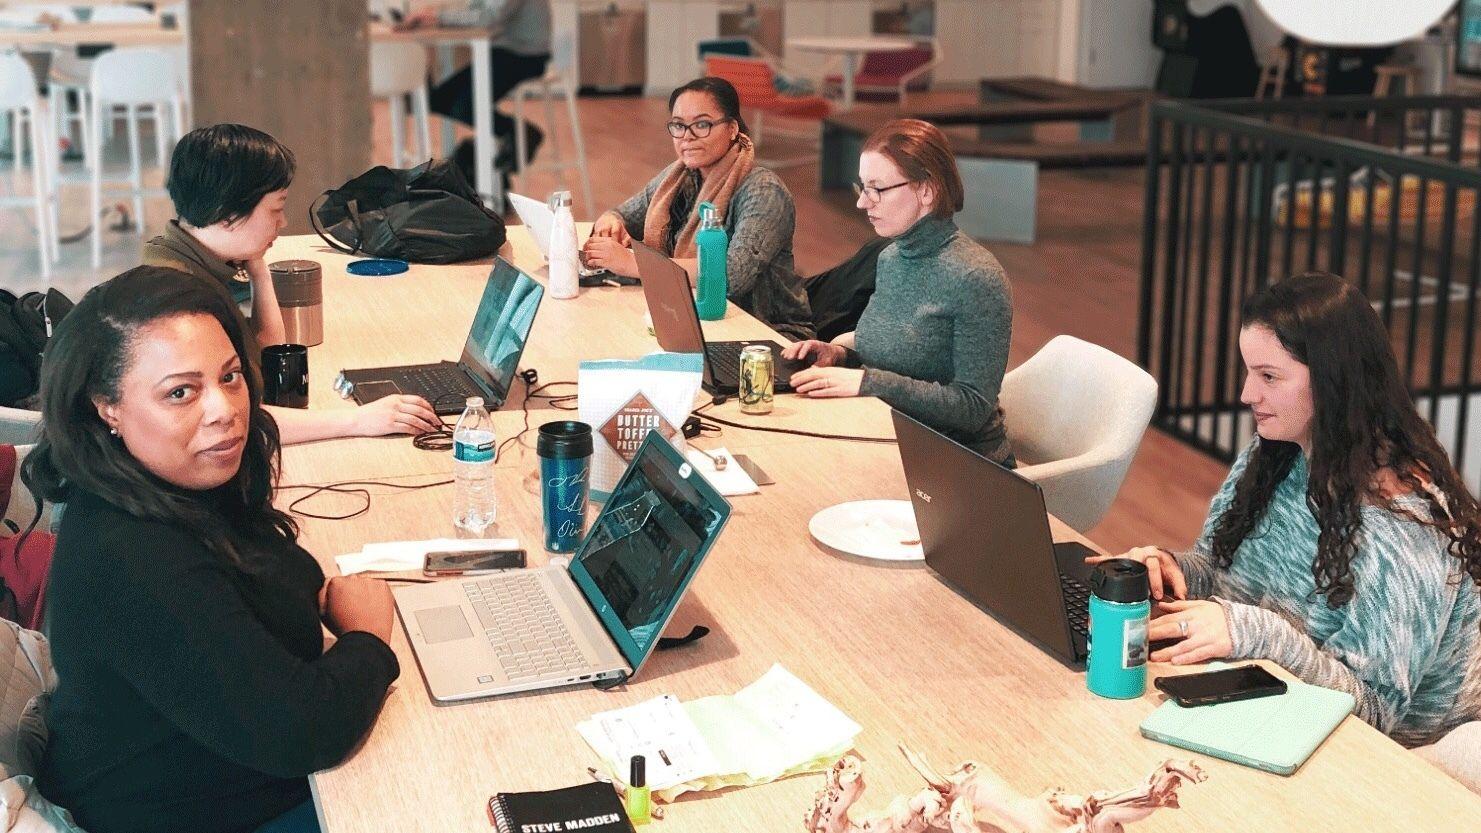 DC Ladies Work Remote - Freelancers, Entrepreneurs, Remote